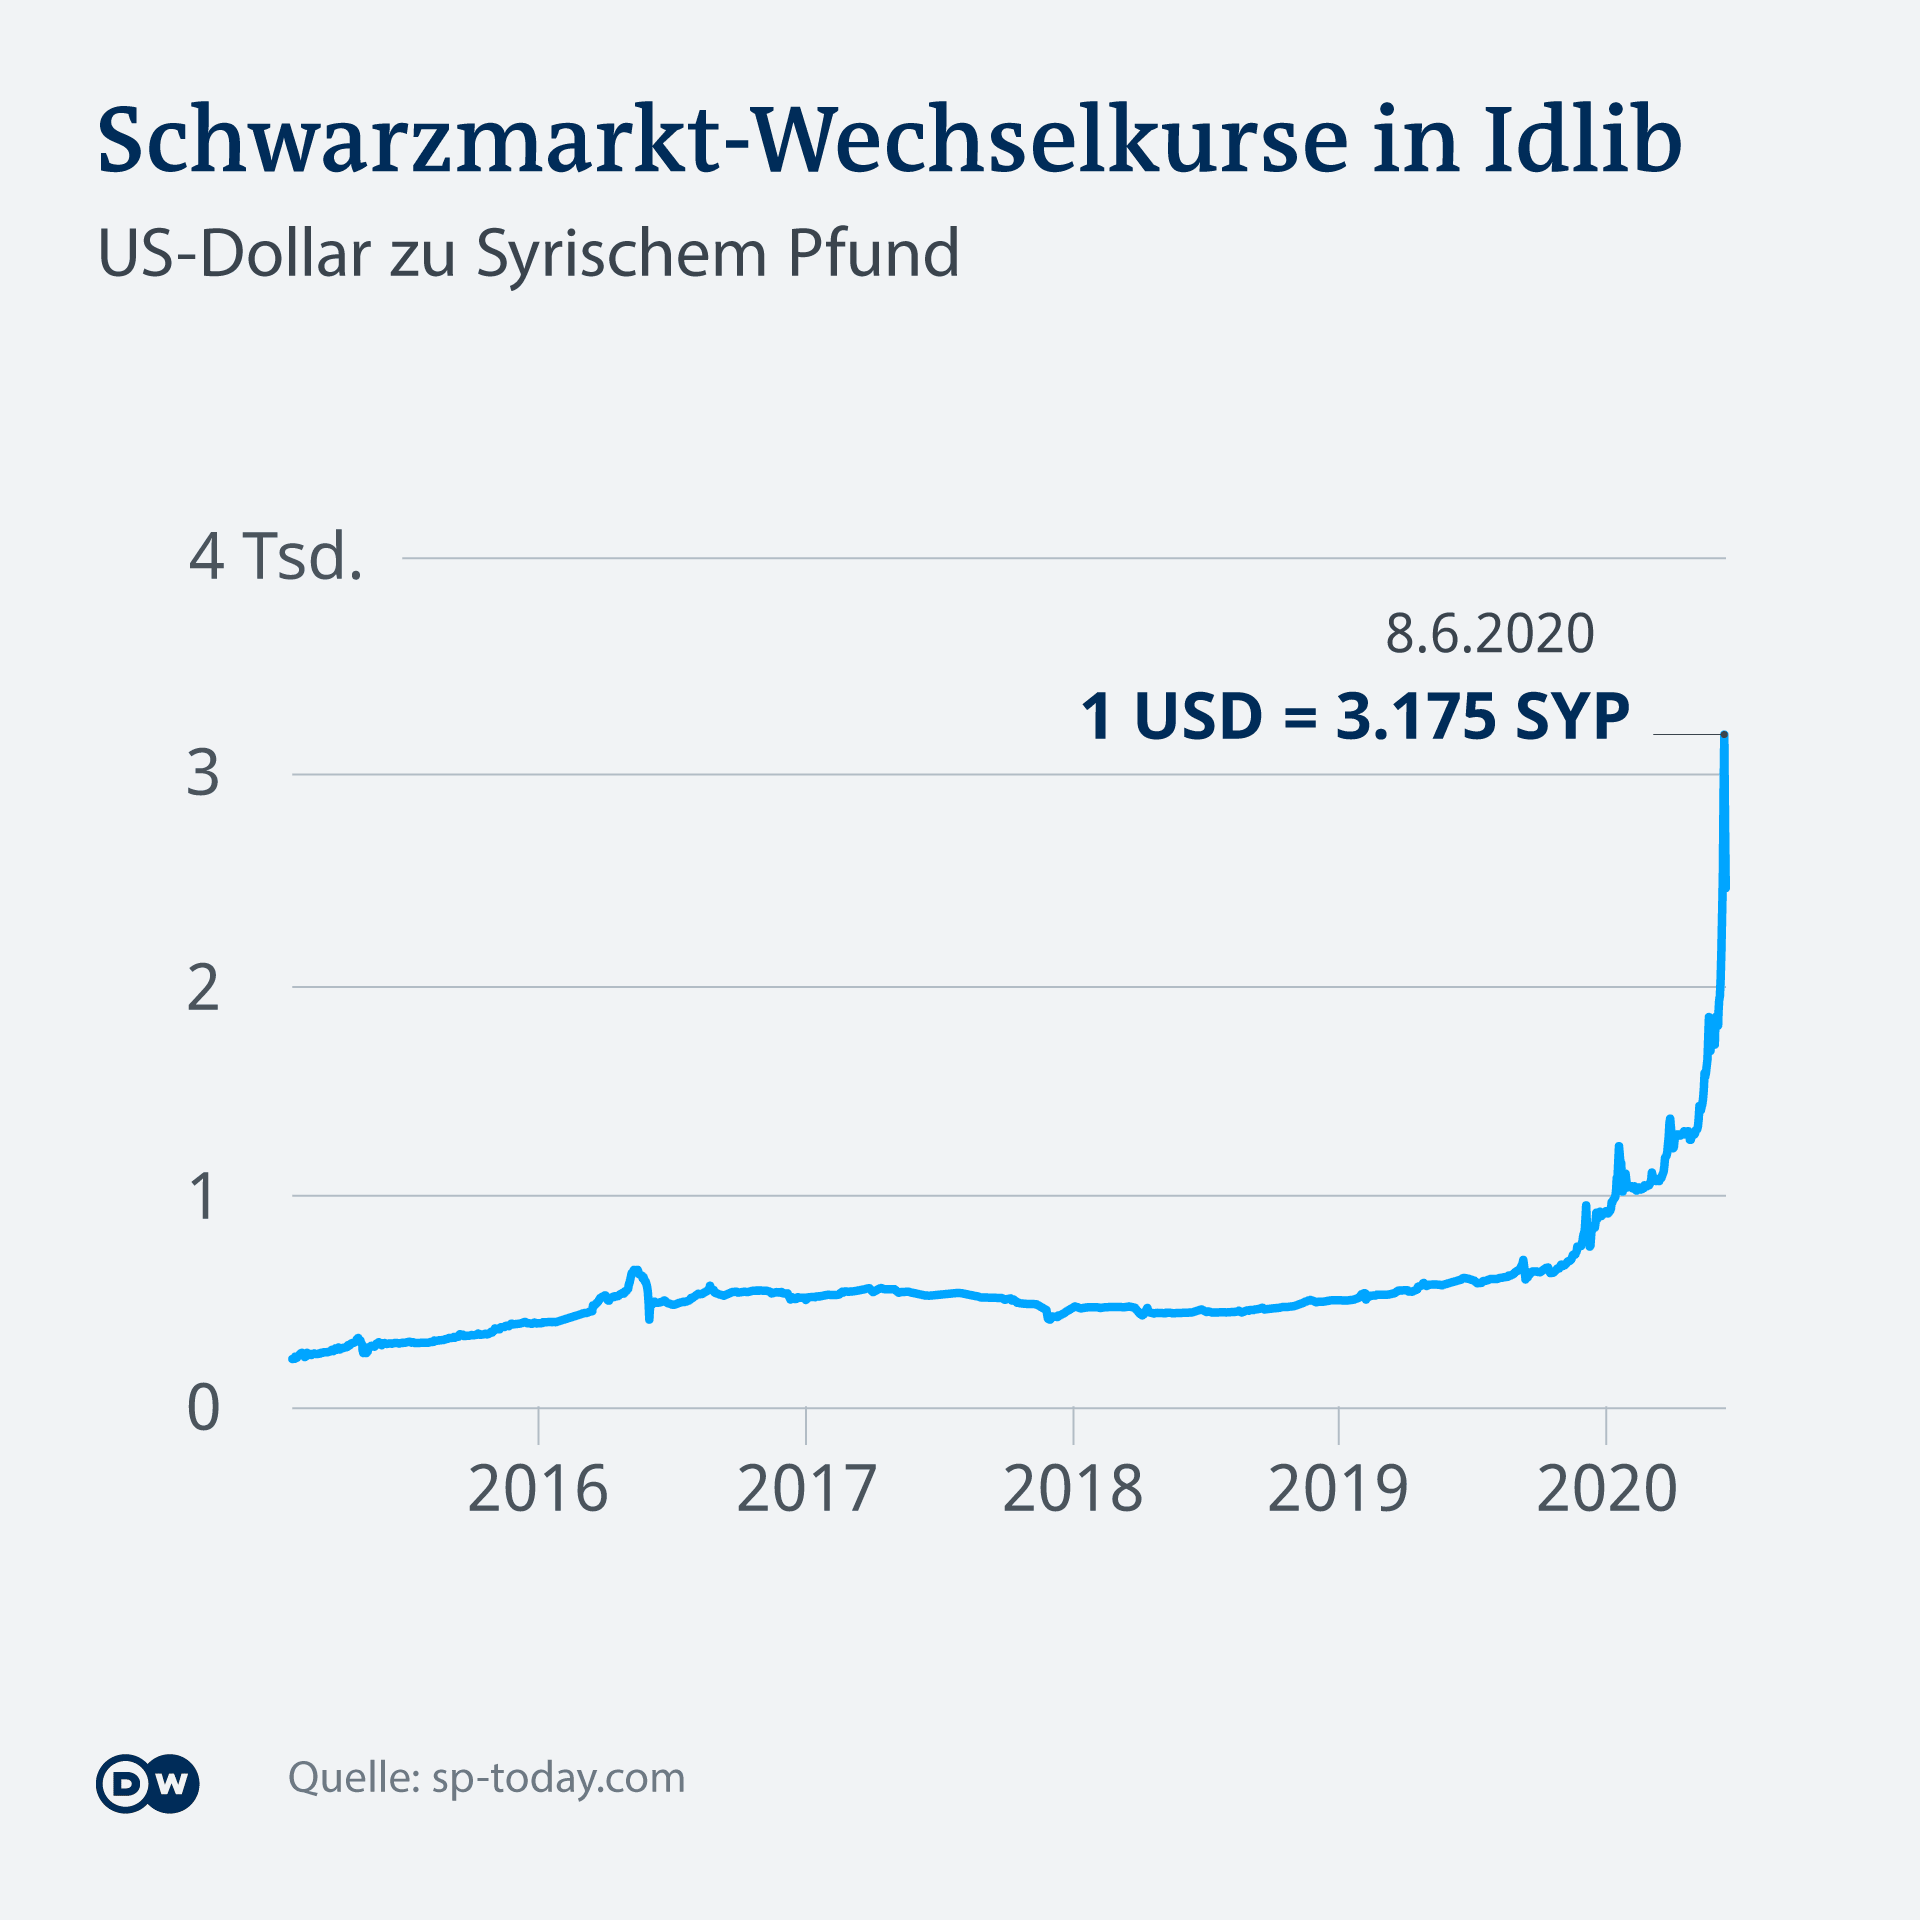 Infografik Schwarzmarkt-Wechselkurse in Idlib DE